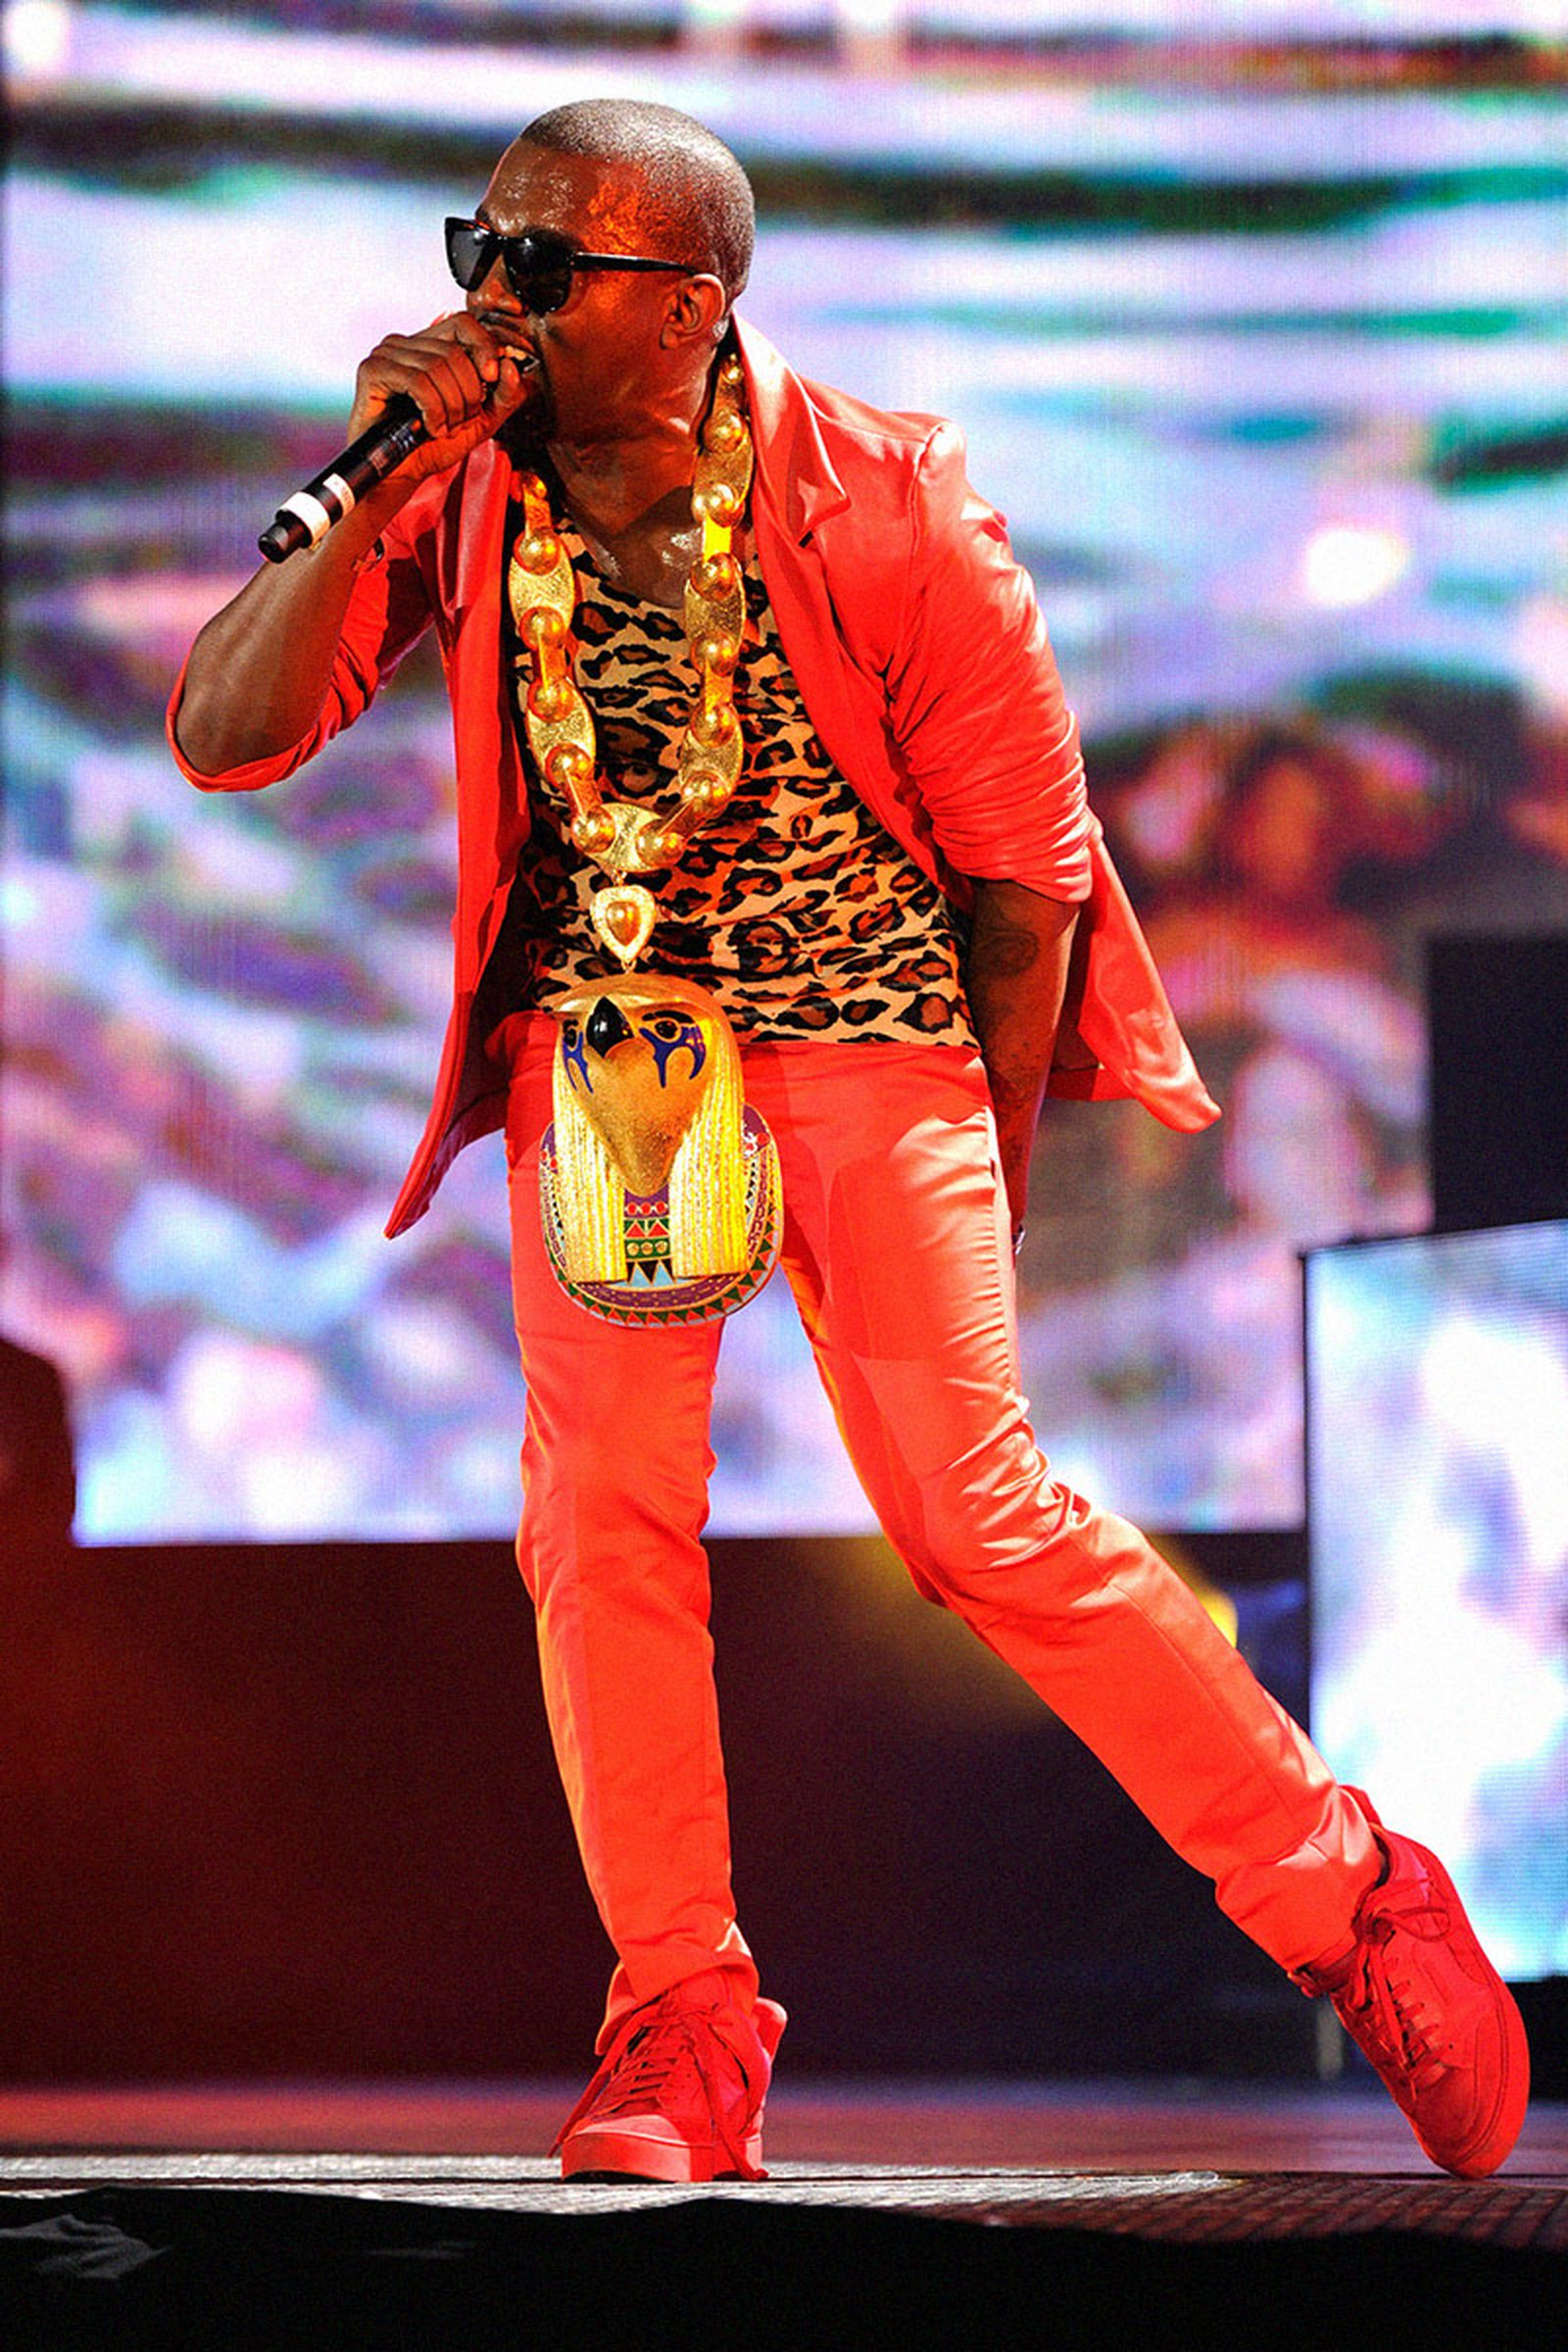 best rapper chains Quavo Yung Berg camron